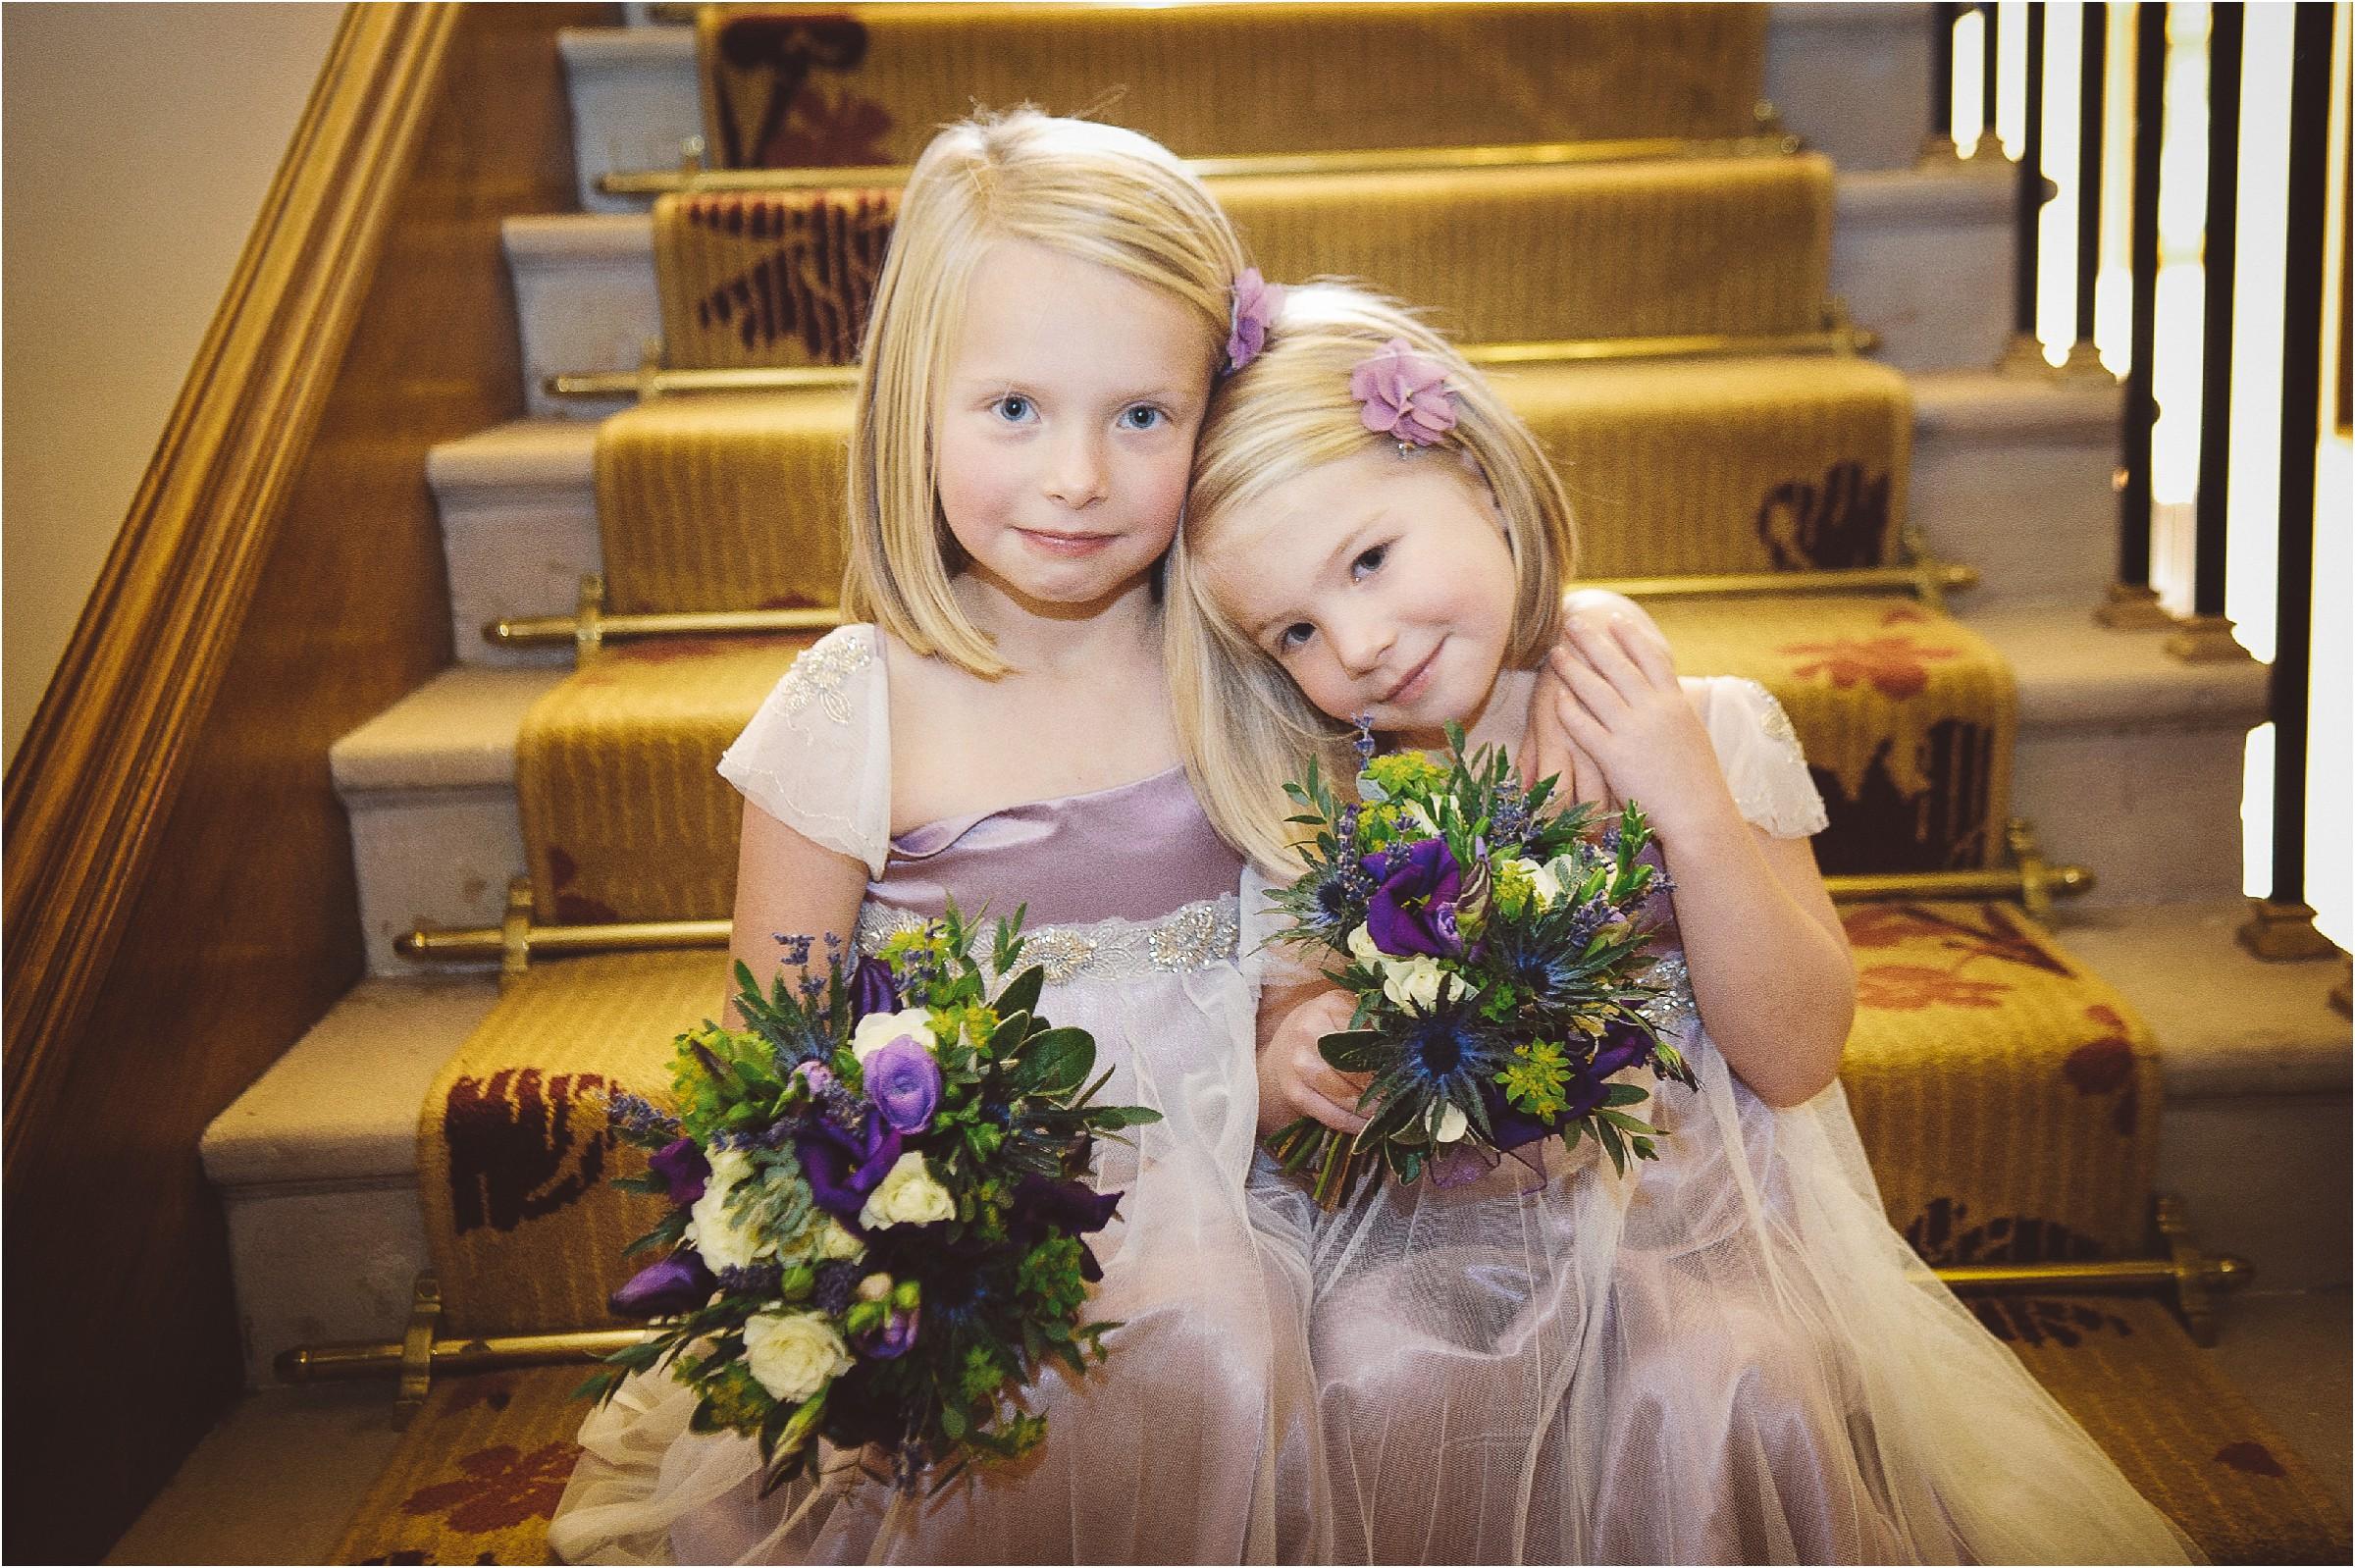 019 wedding photography doxford hall northumberlandDSC_0586e